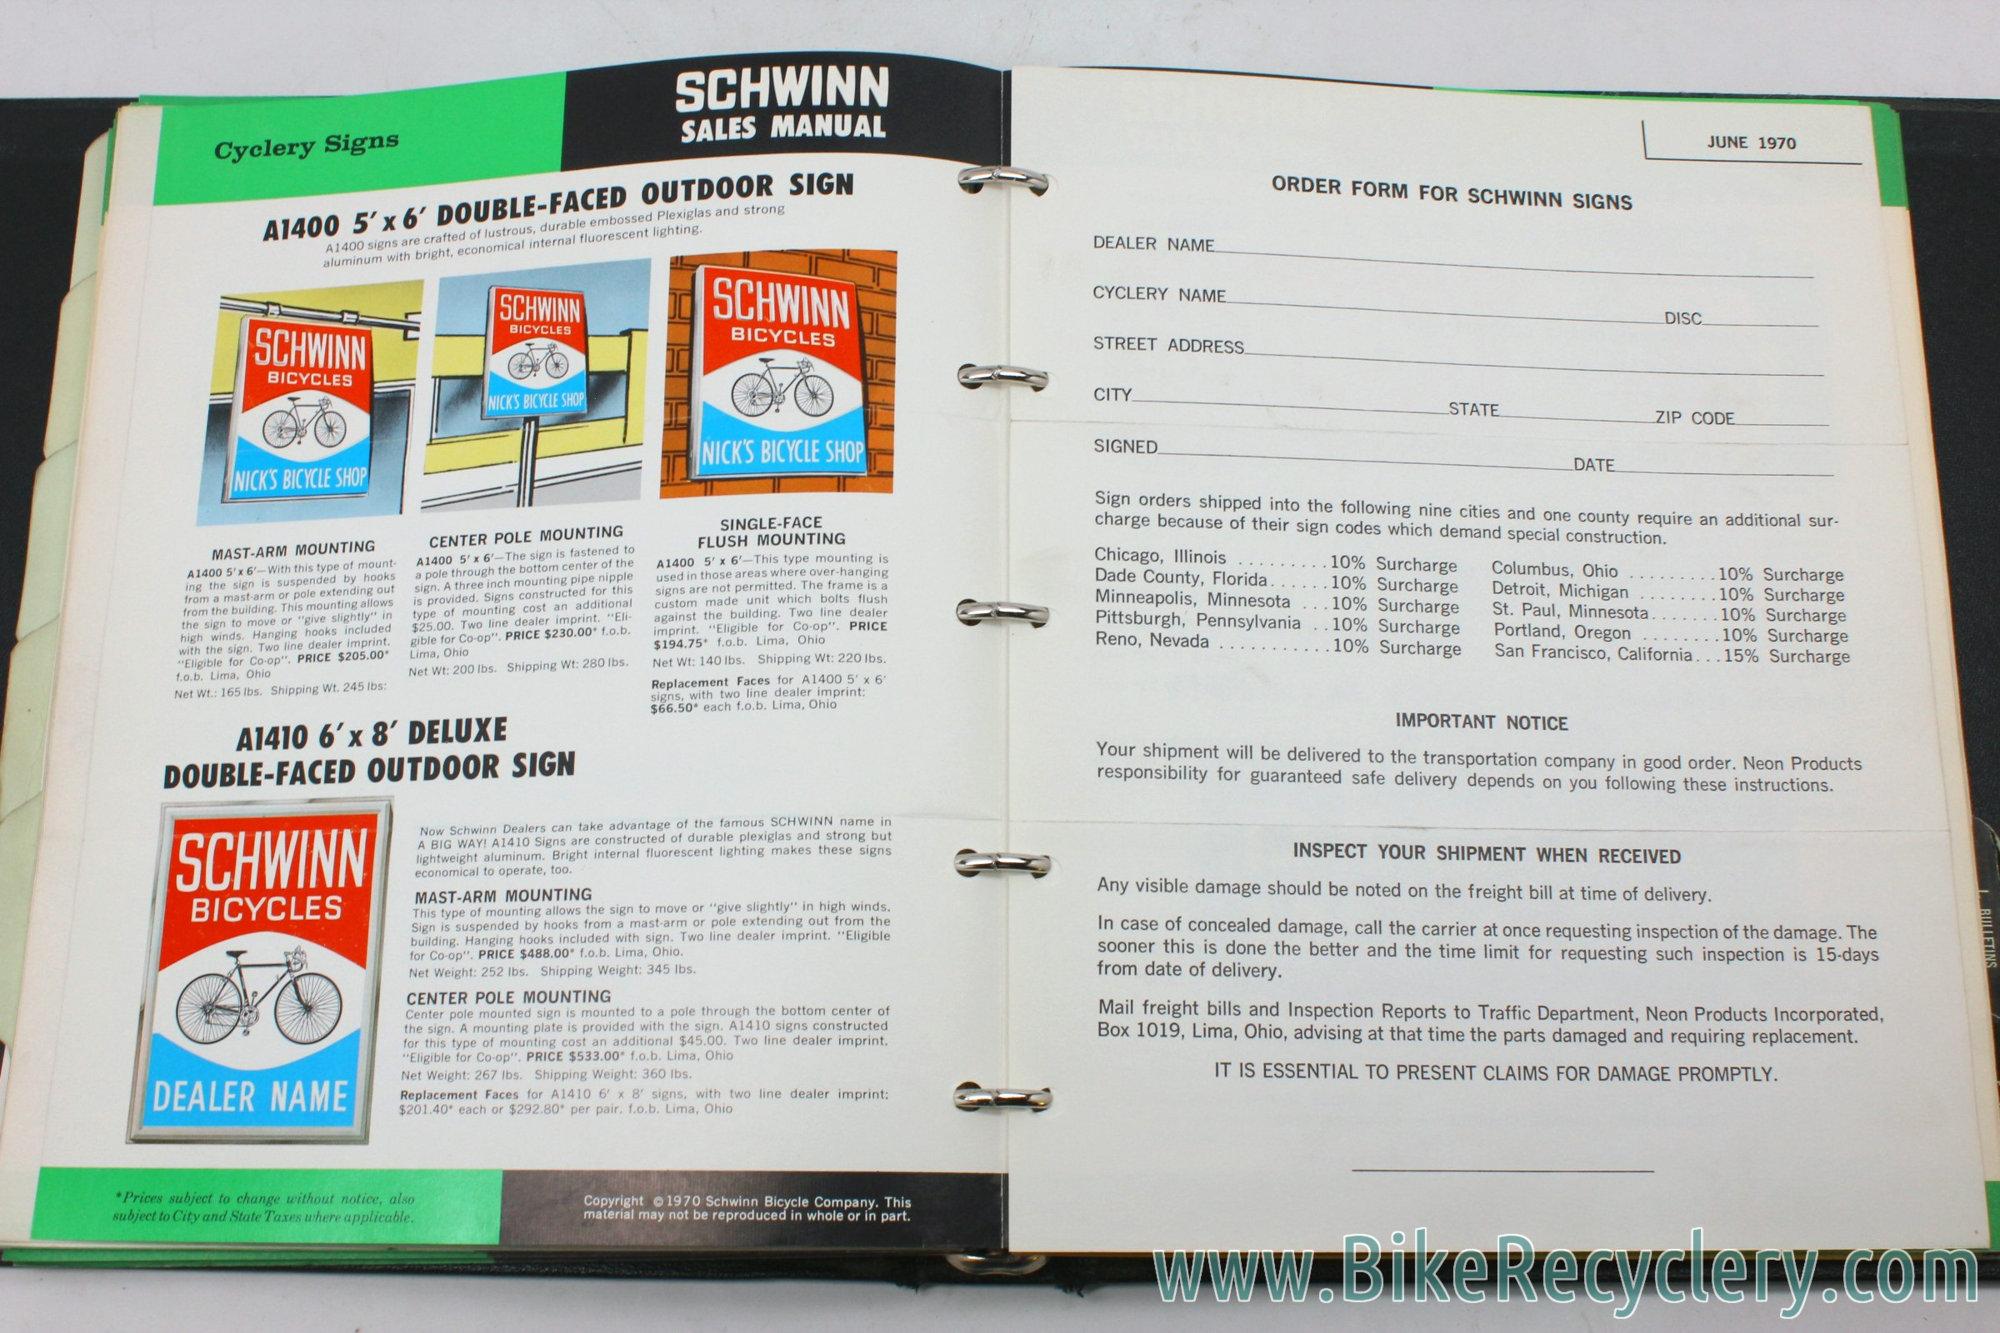 vintage_schwinn_memorabilia_catalogs_dealer_service_manuals_17825.JPG